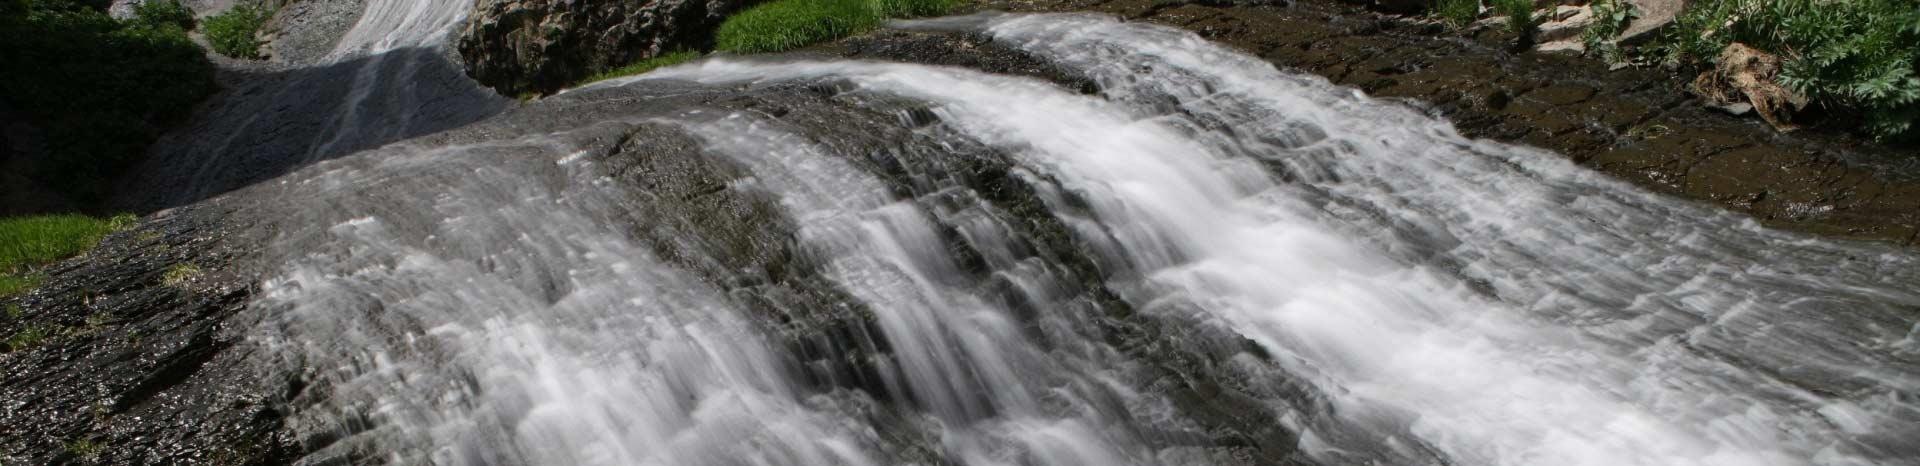 Jermuk Waterfall | First Travel Tour operator in Armenia